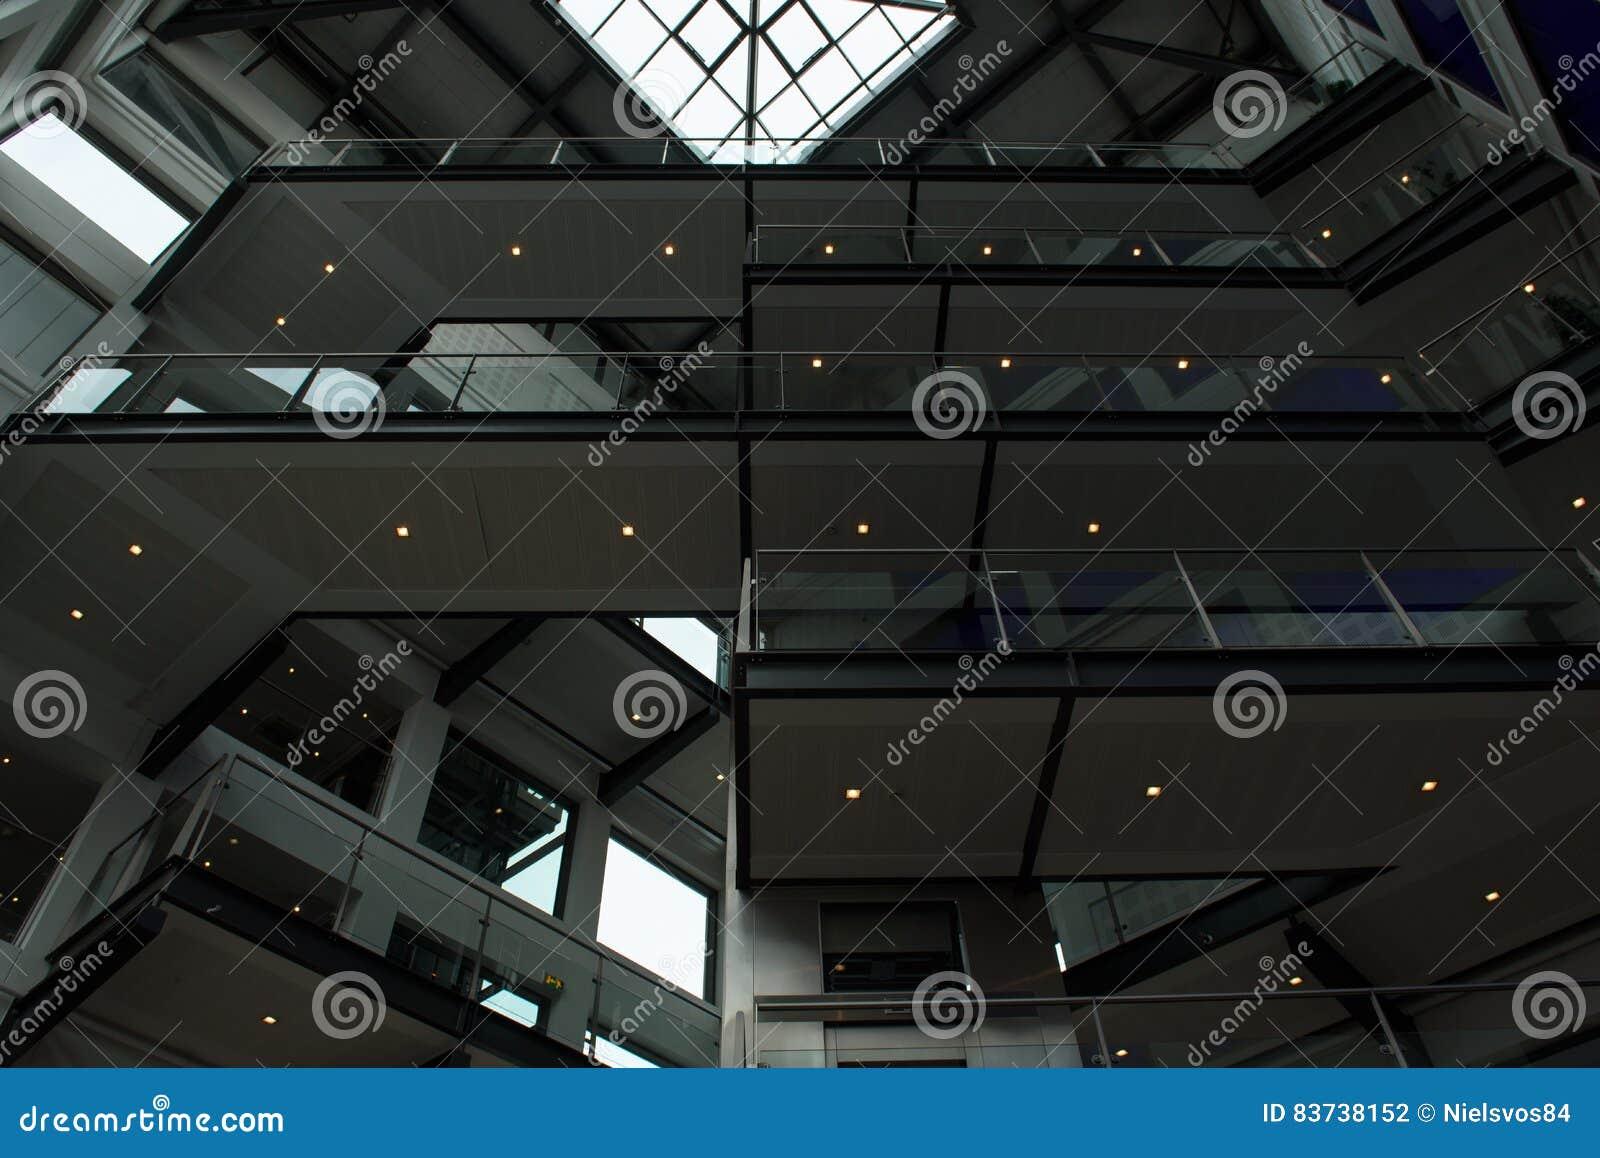 Líneas fuertes en un modelo en diseño interior moderno